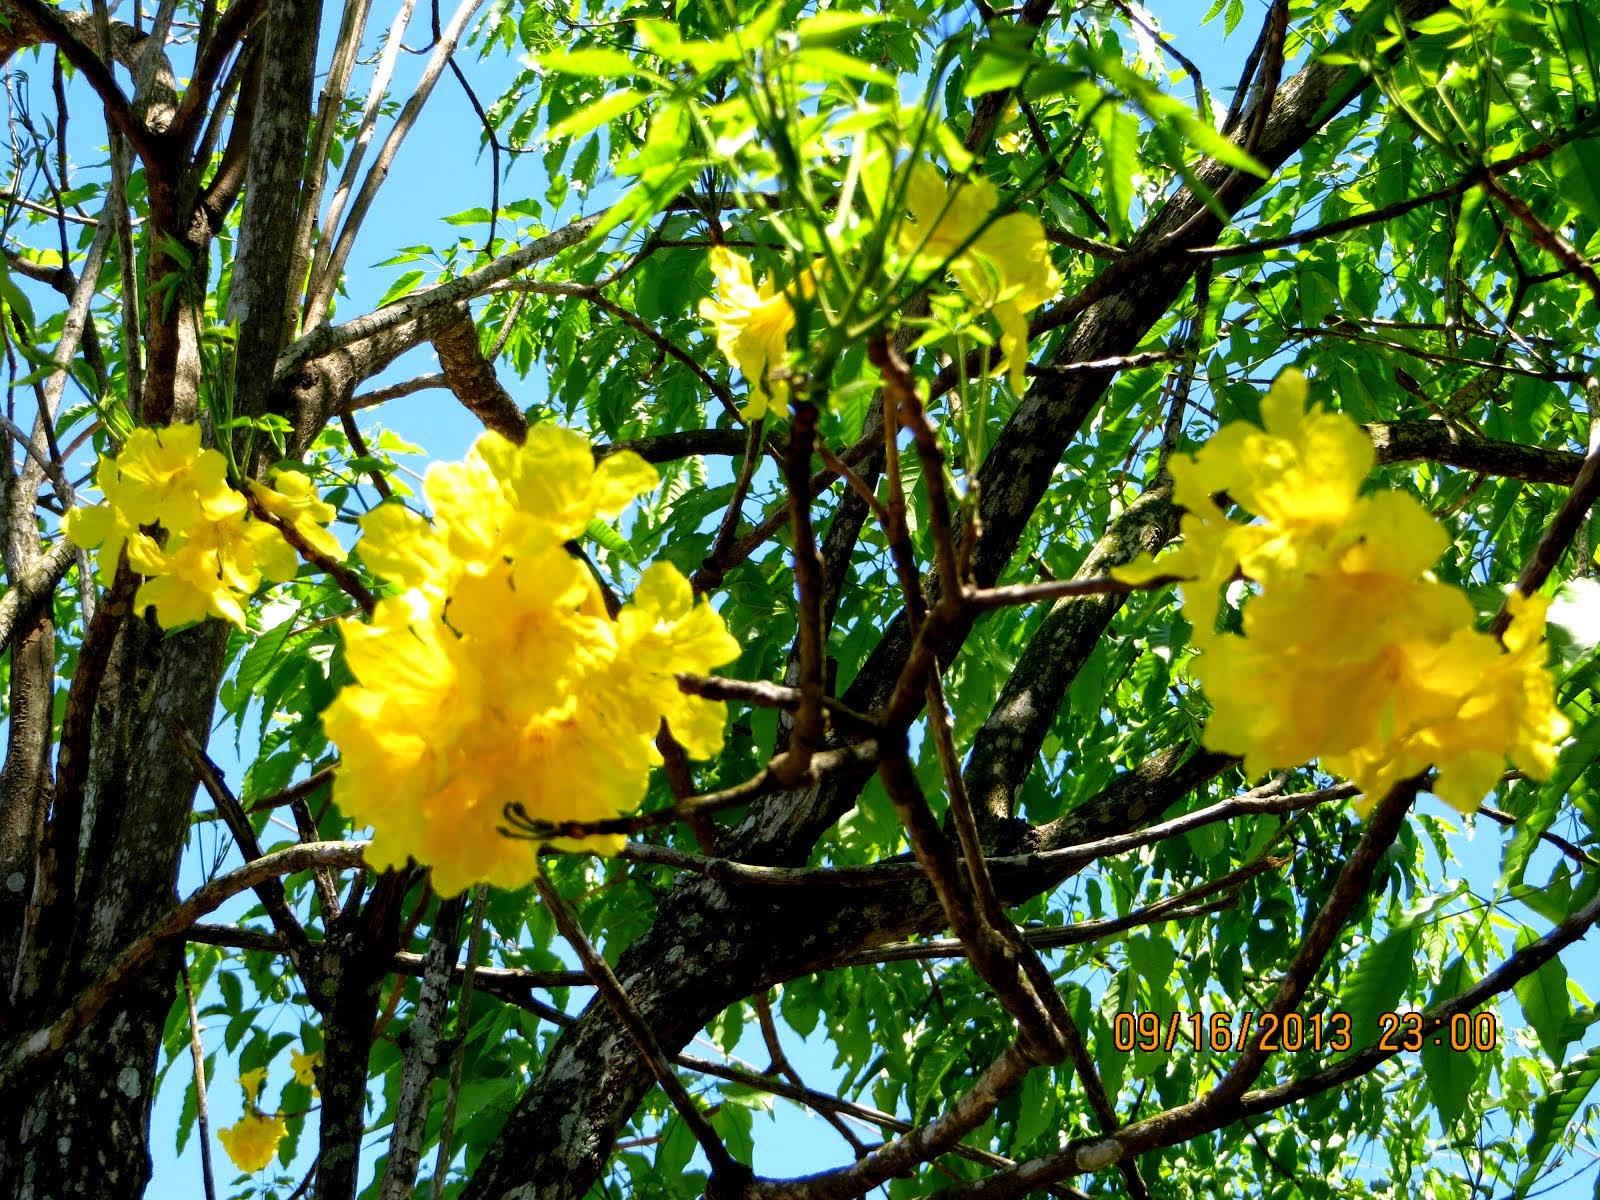 Flora de mi tierra